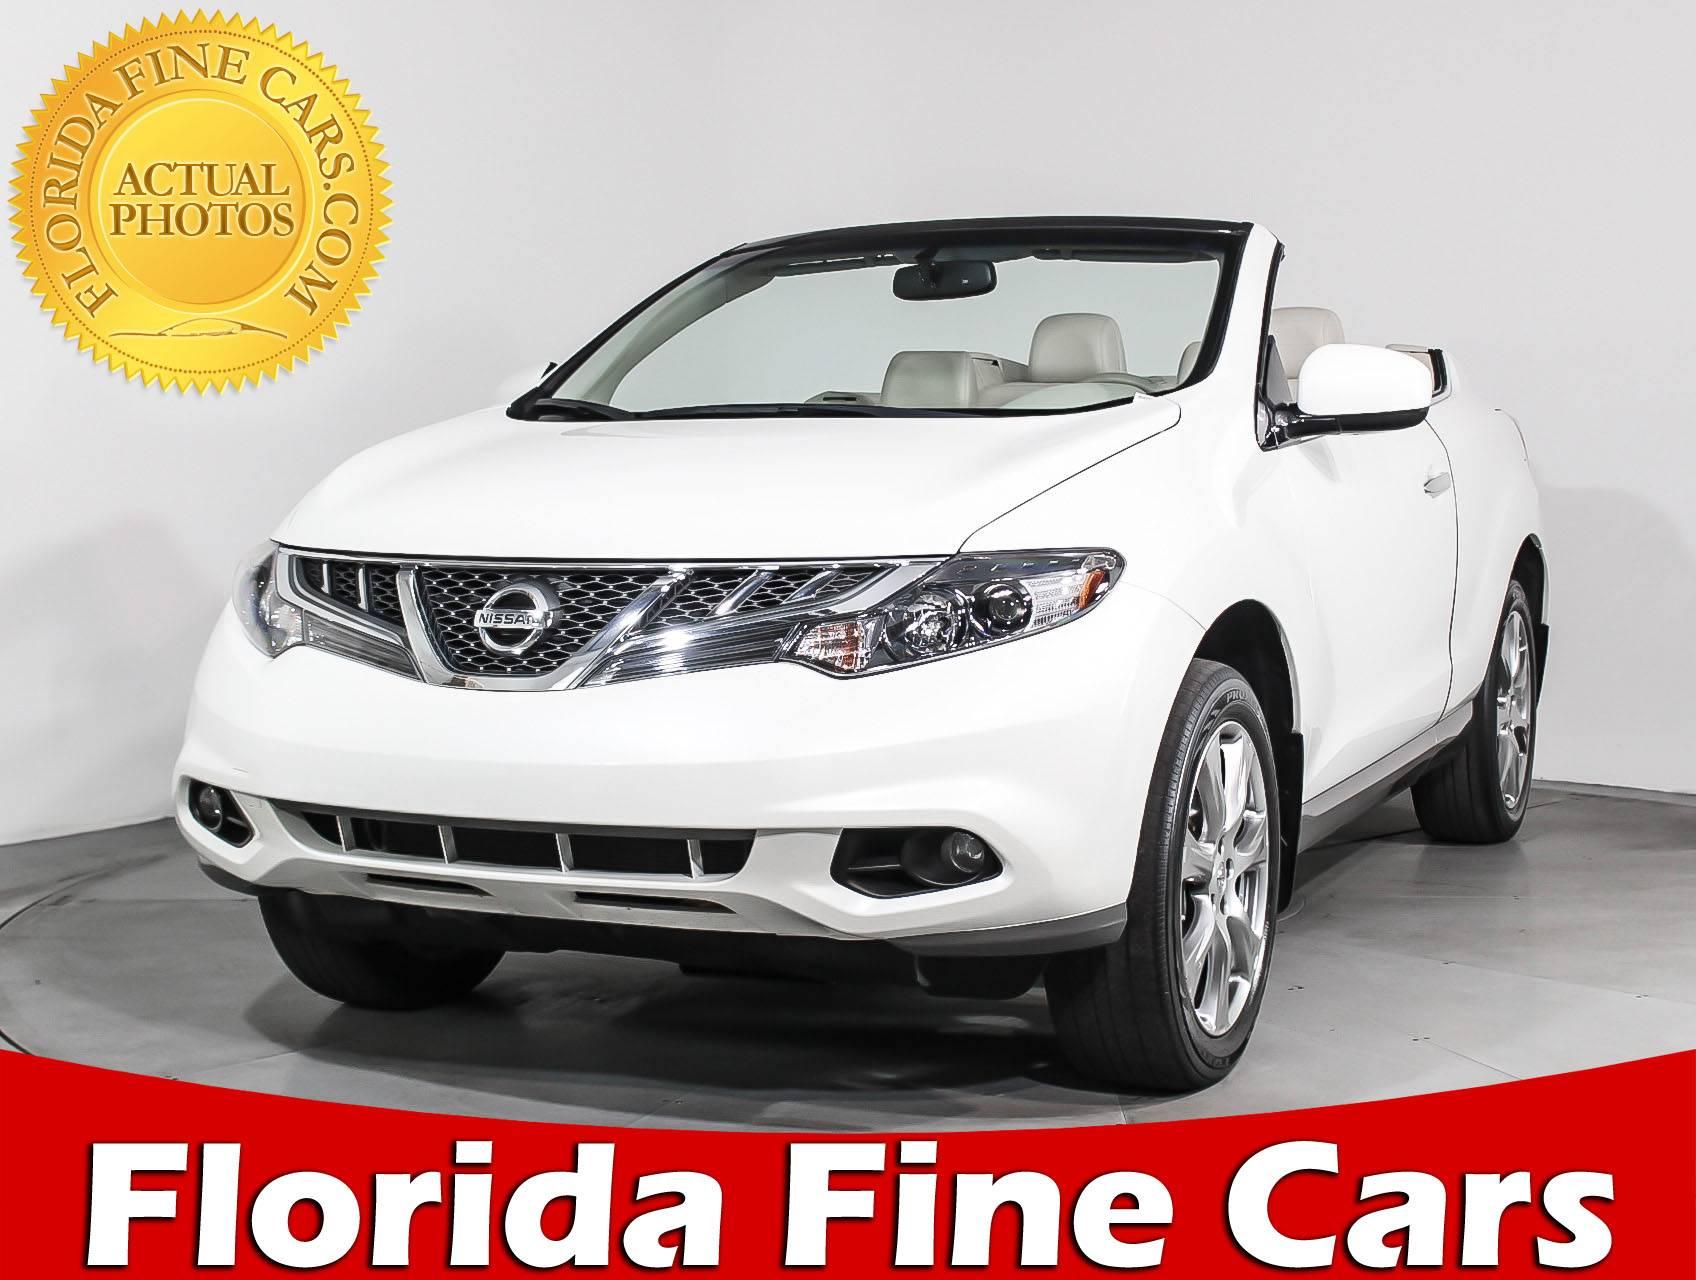 Used 2014 NISSAN MURANO CROSSCABRIOLET Convertible For Sale In MIAMI, FL    93427   Florida Fine Cars